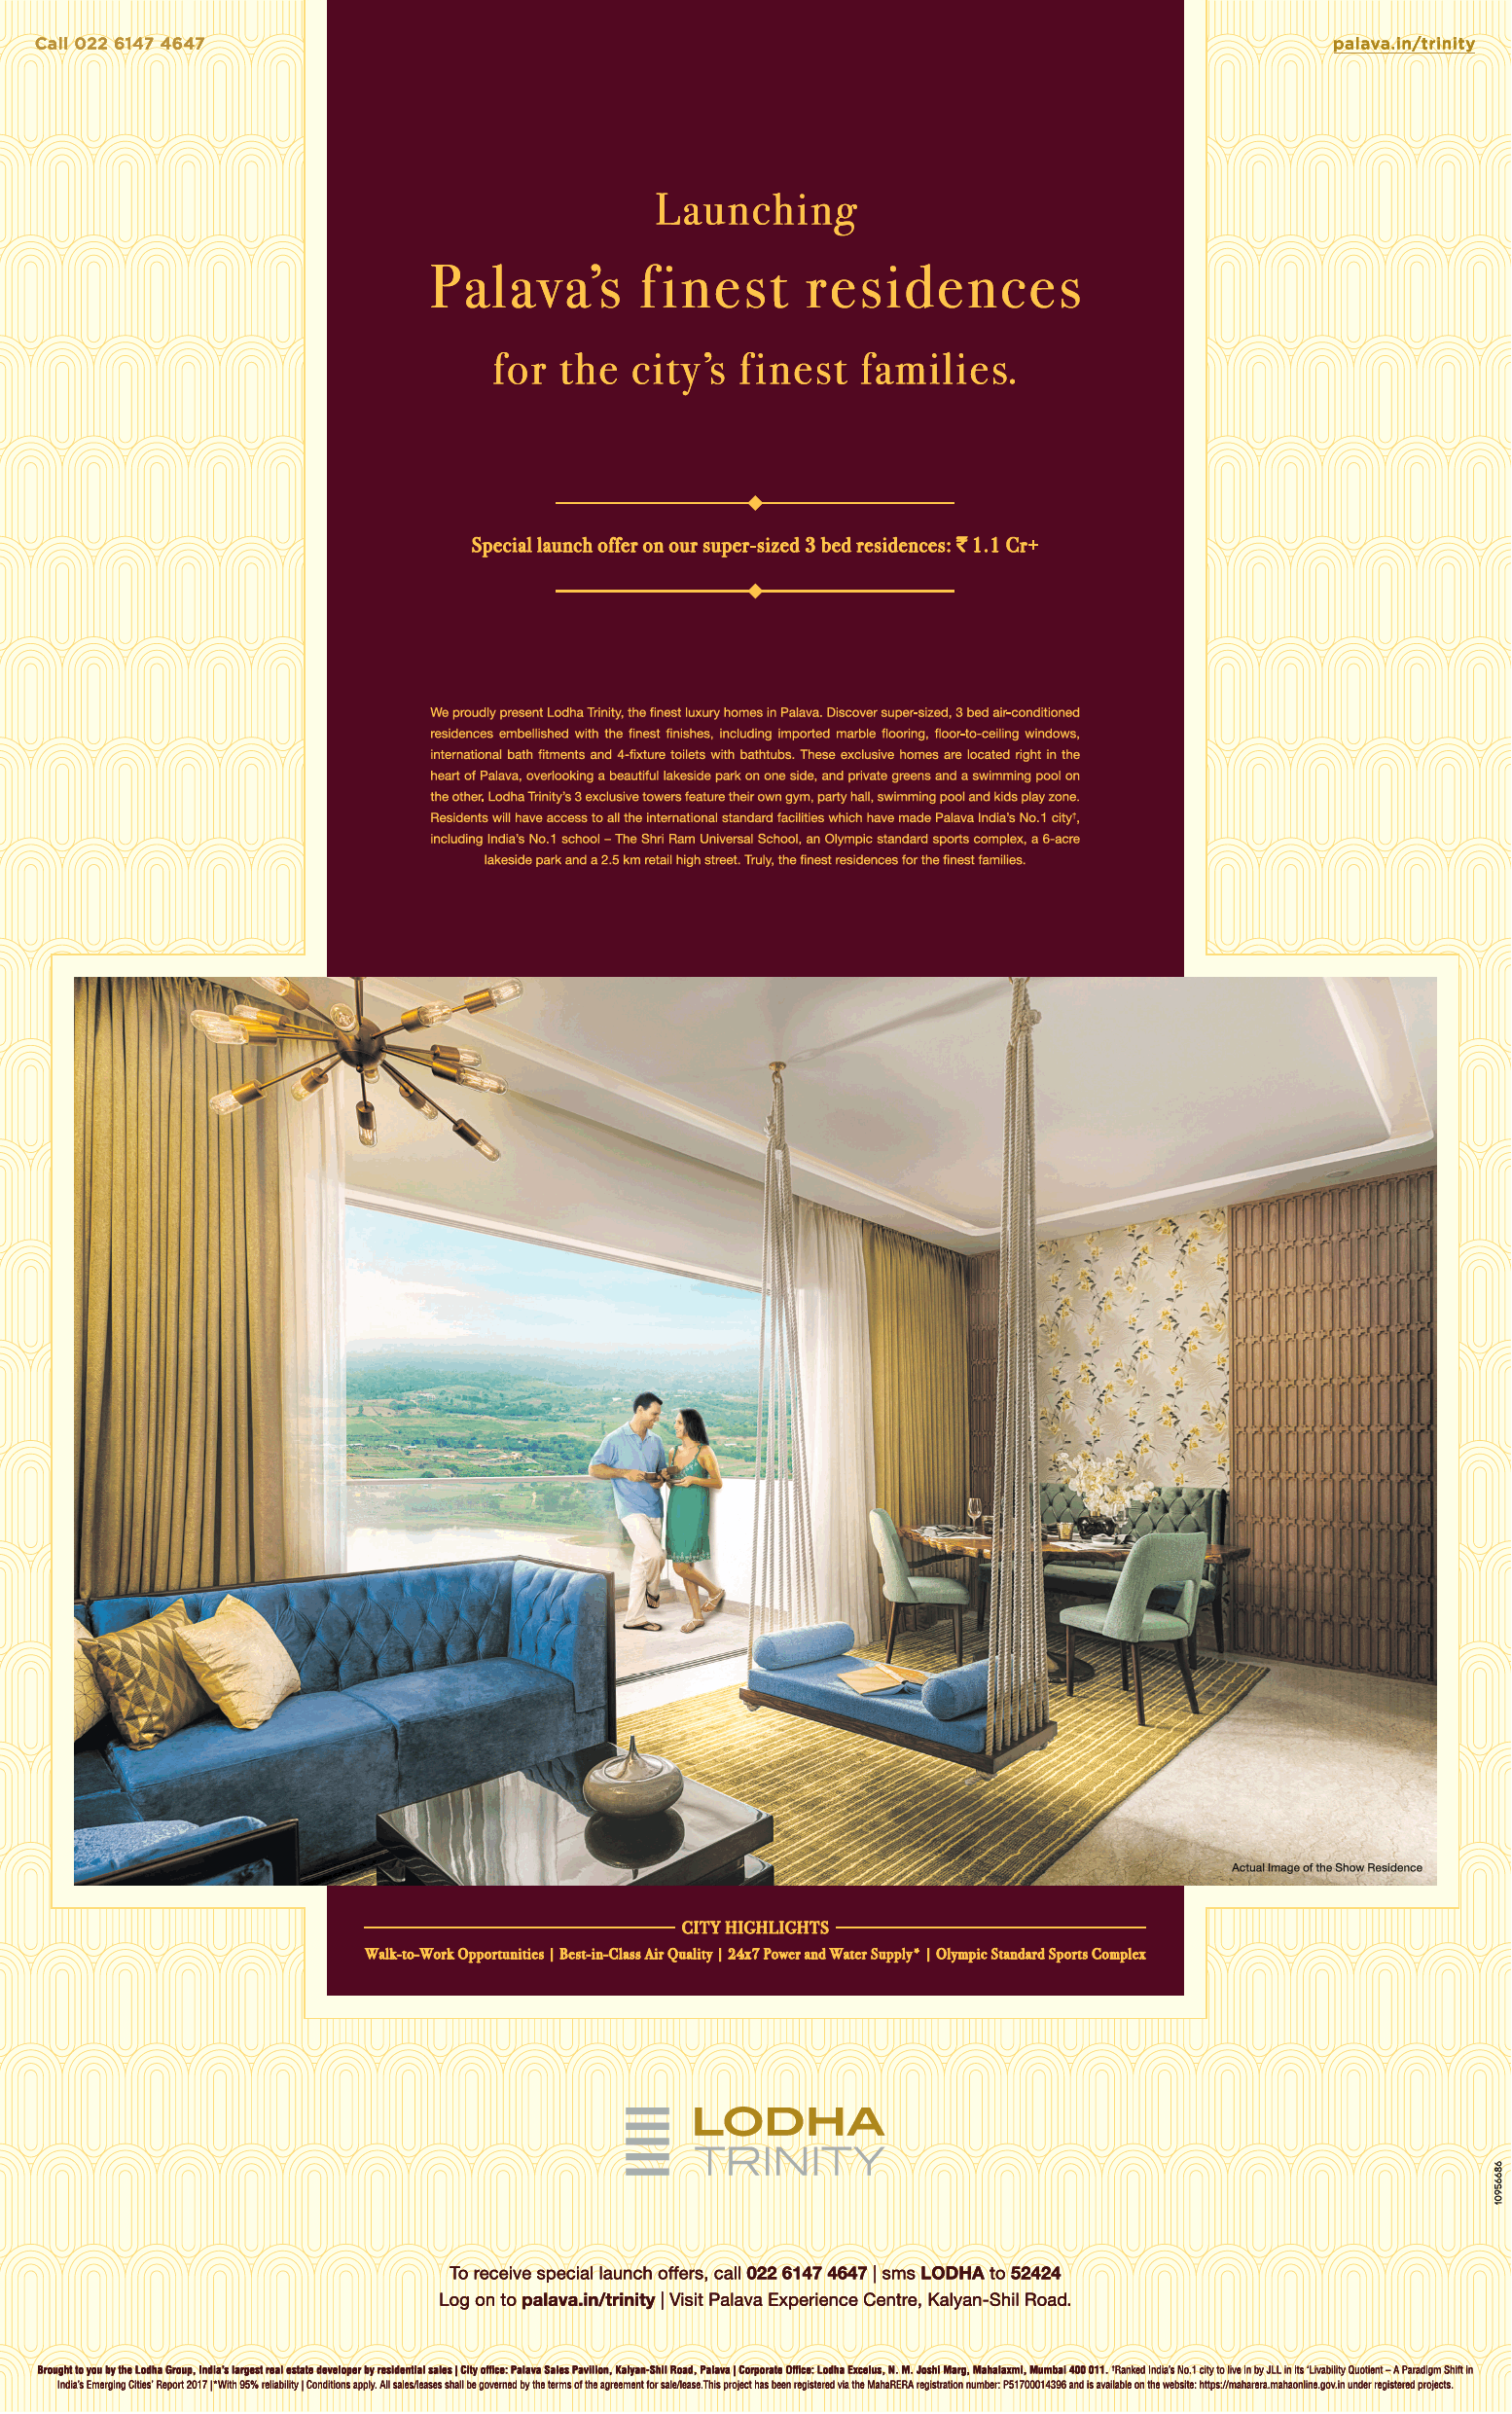 Lodha Trinity Launching Palavas Finest Residences Ad